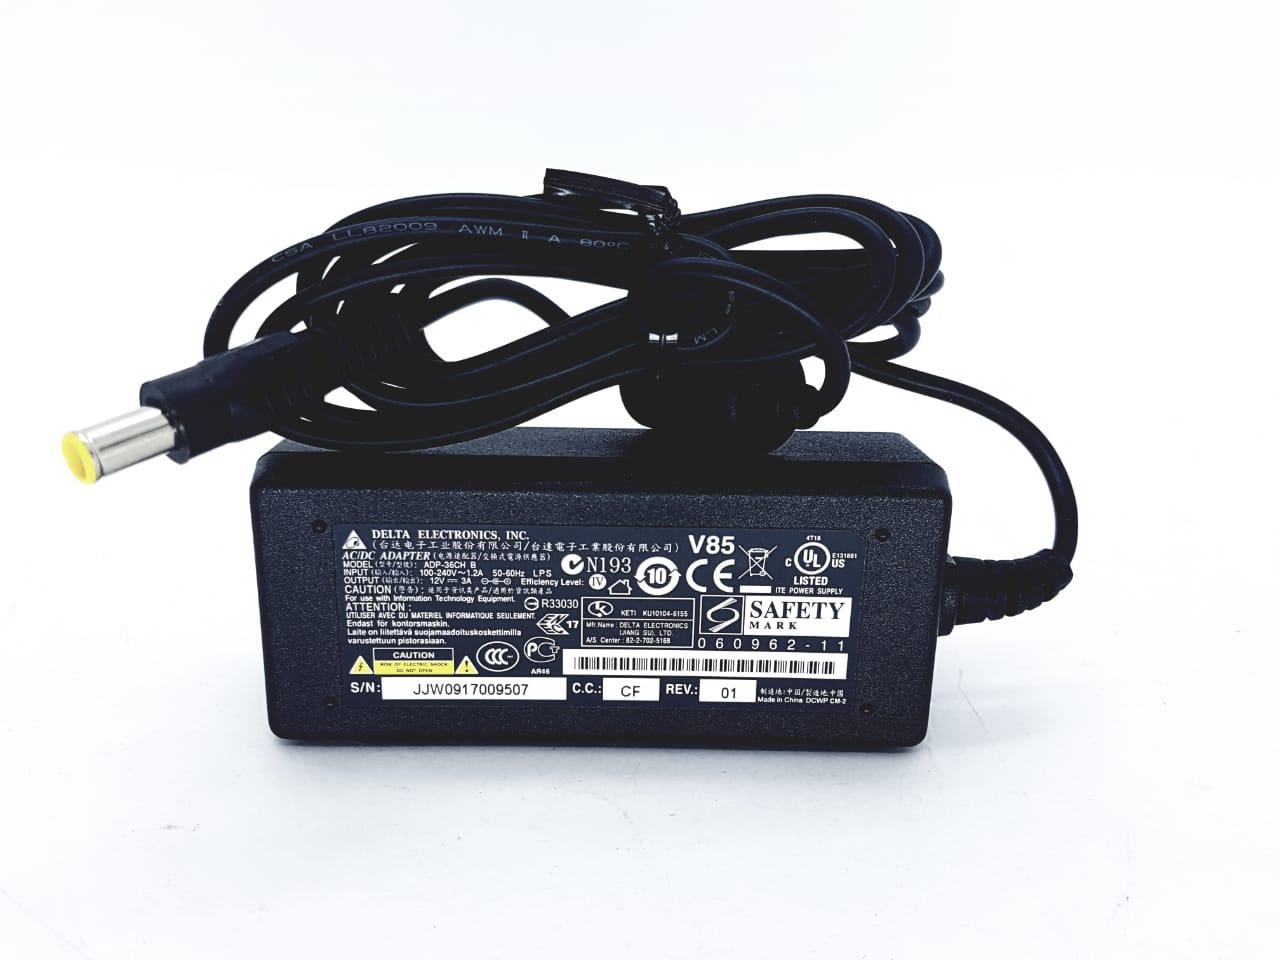 Fonte delta 12 v 3 amp para monitor LG ADP-36CH